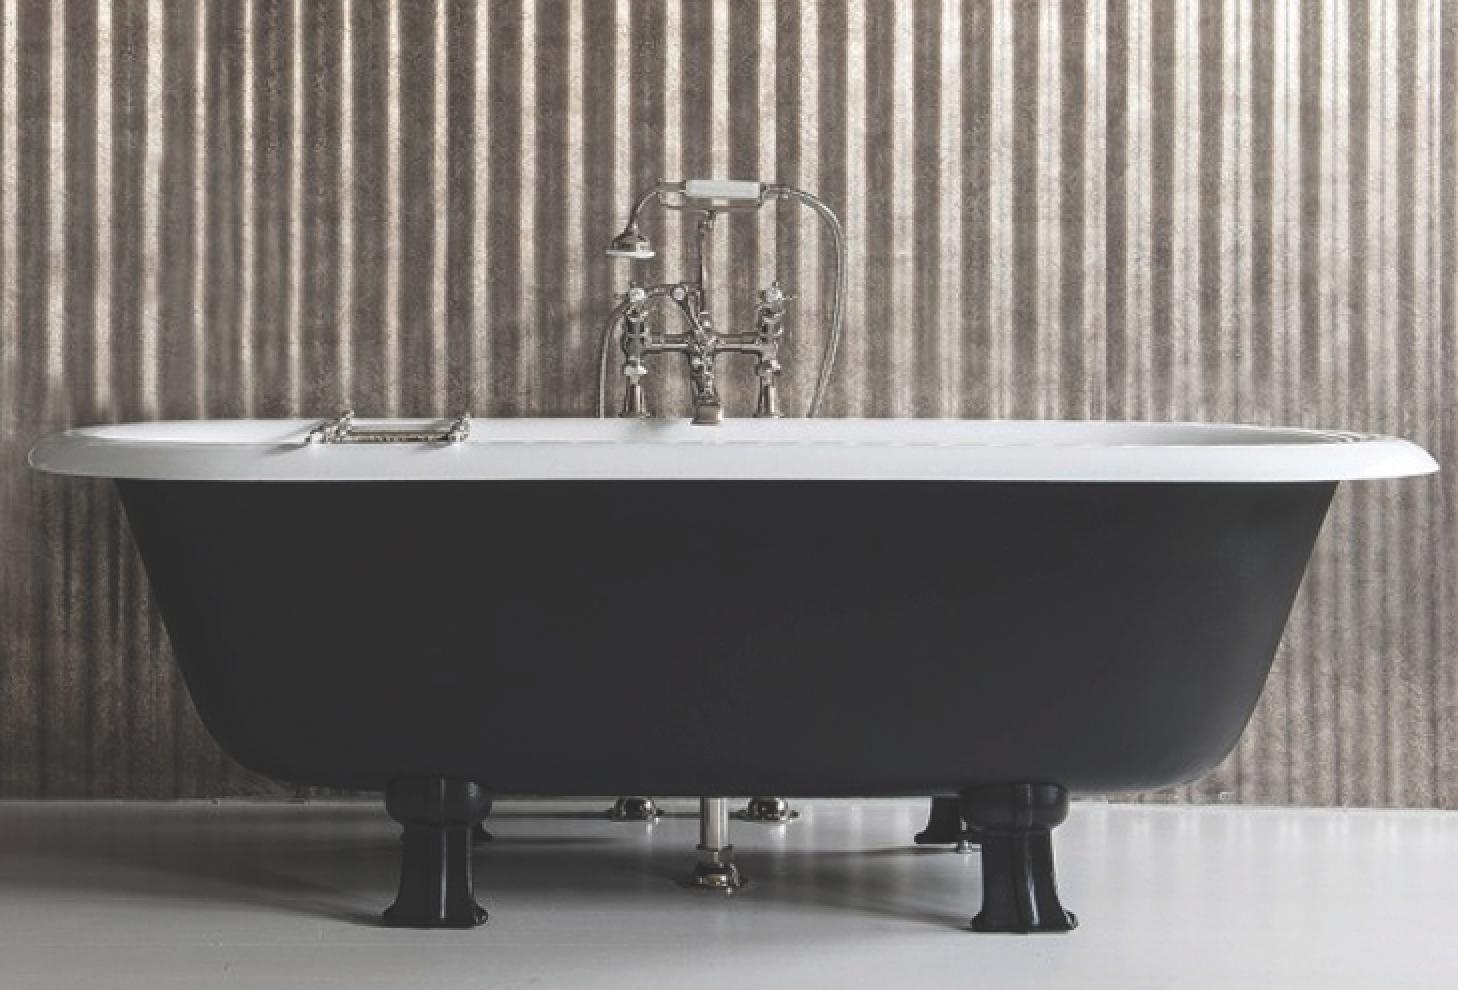 freestanding bathtub spey tub remodelista 20